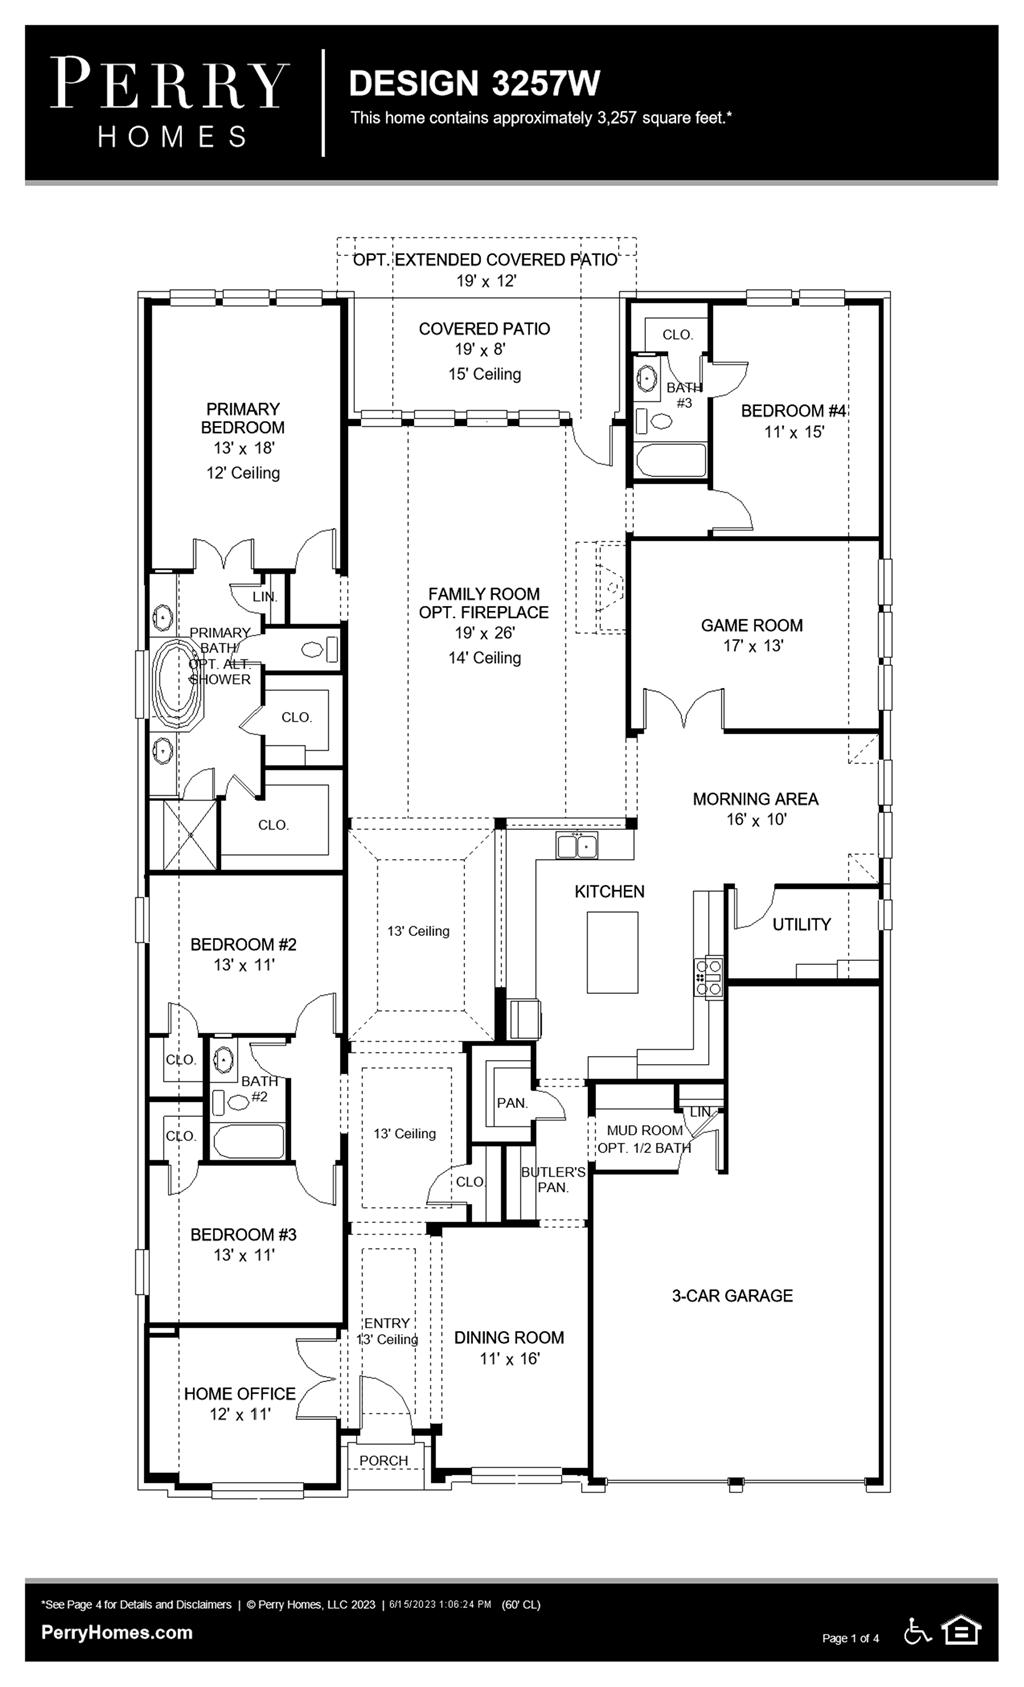 Floor Plan for 3257W